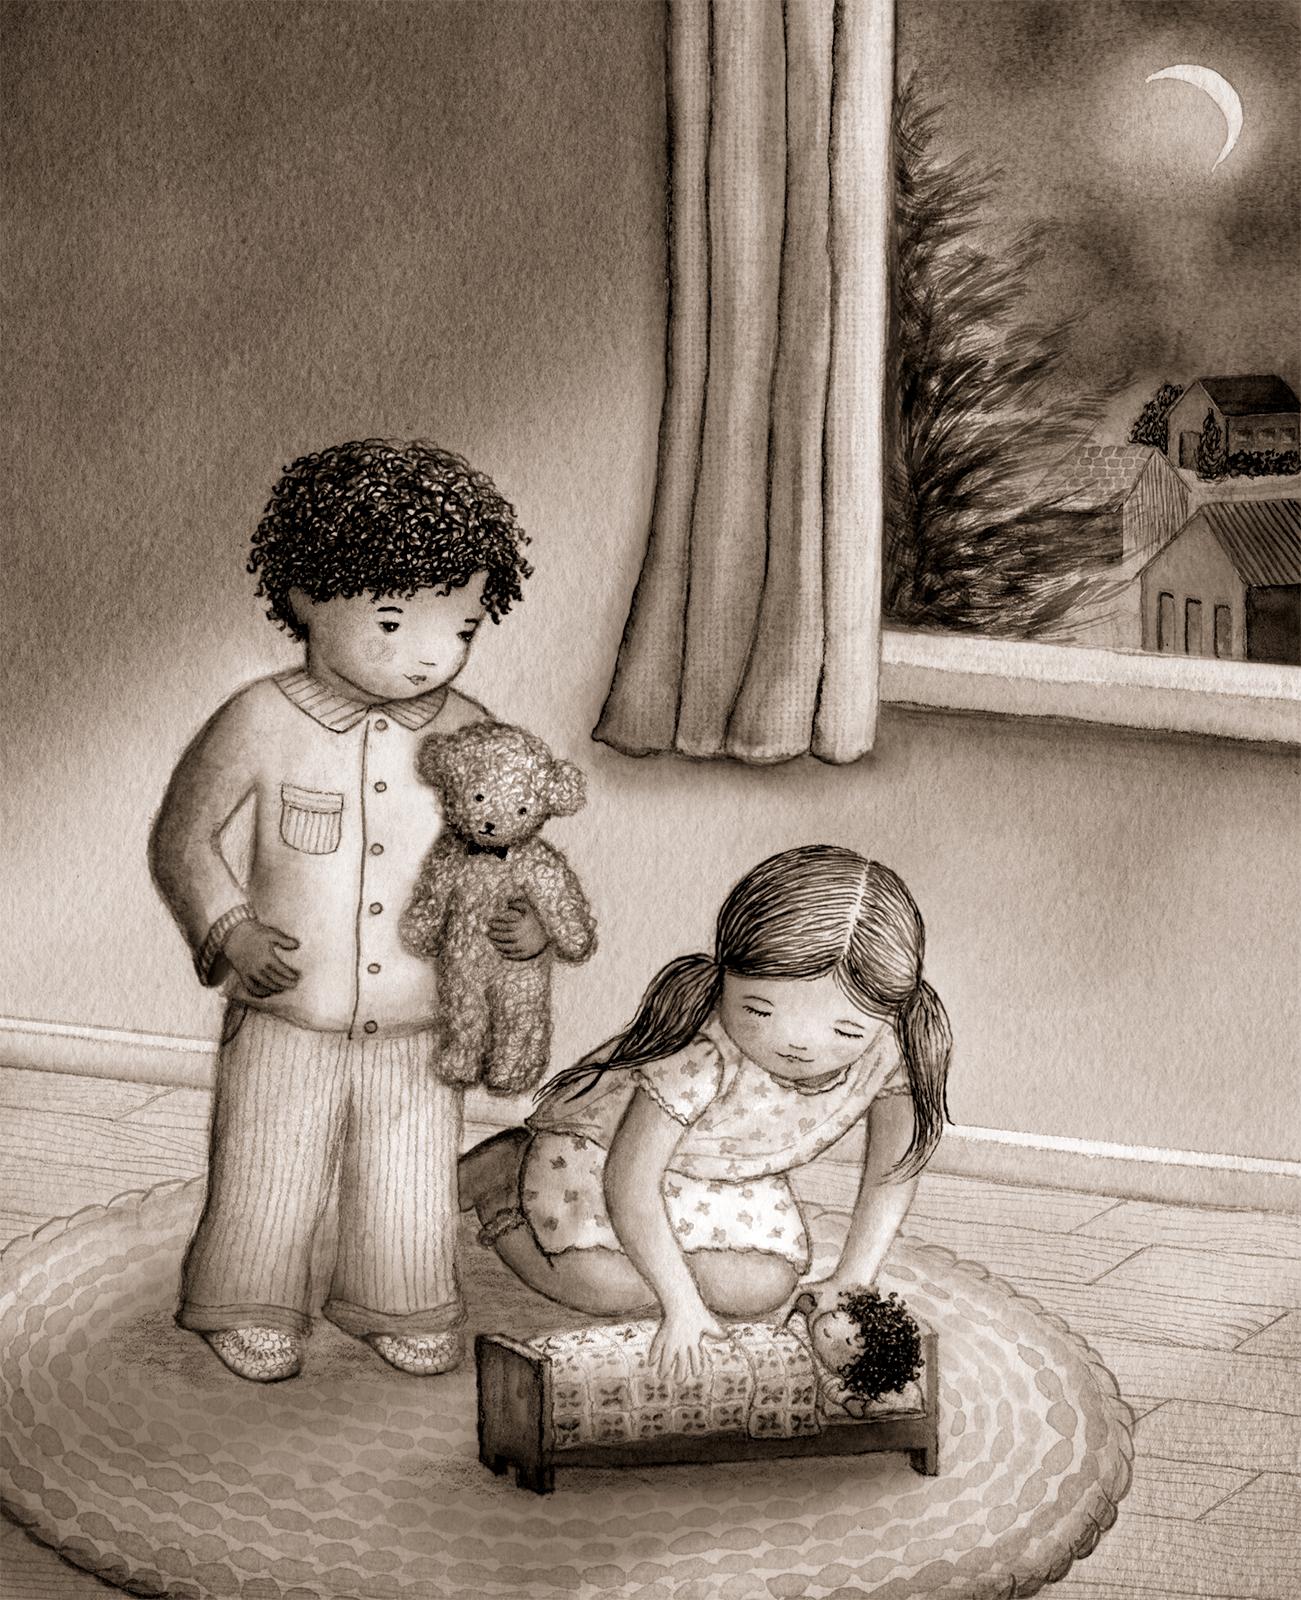 joy_dabby_bedtime2.jpg